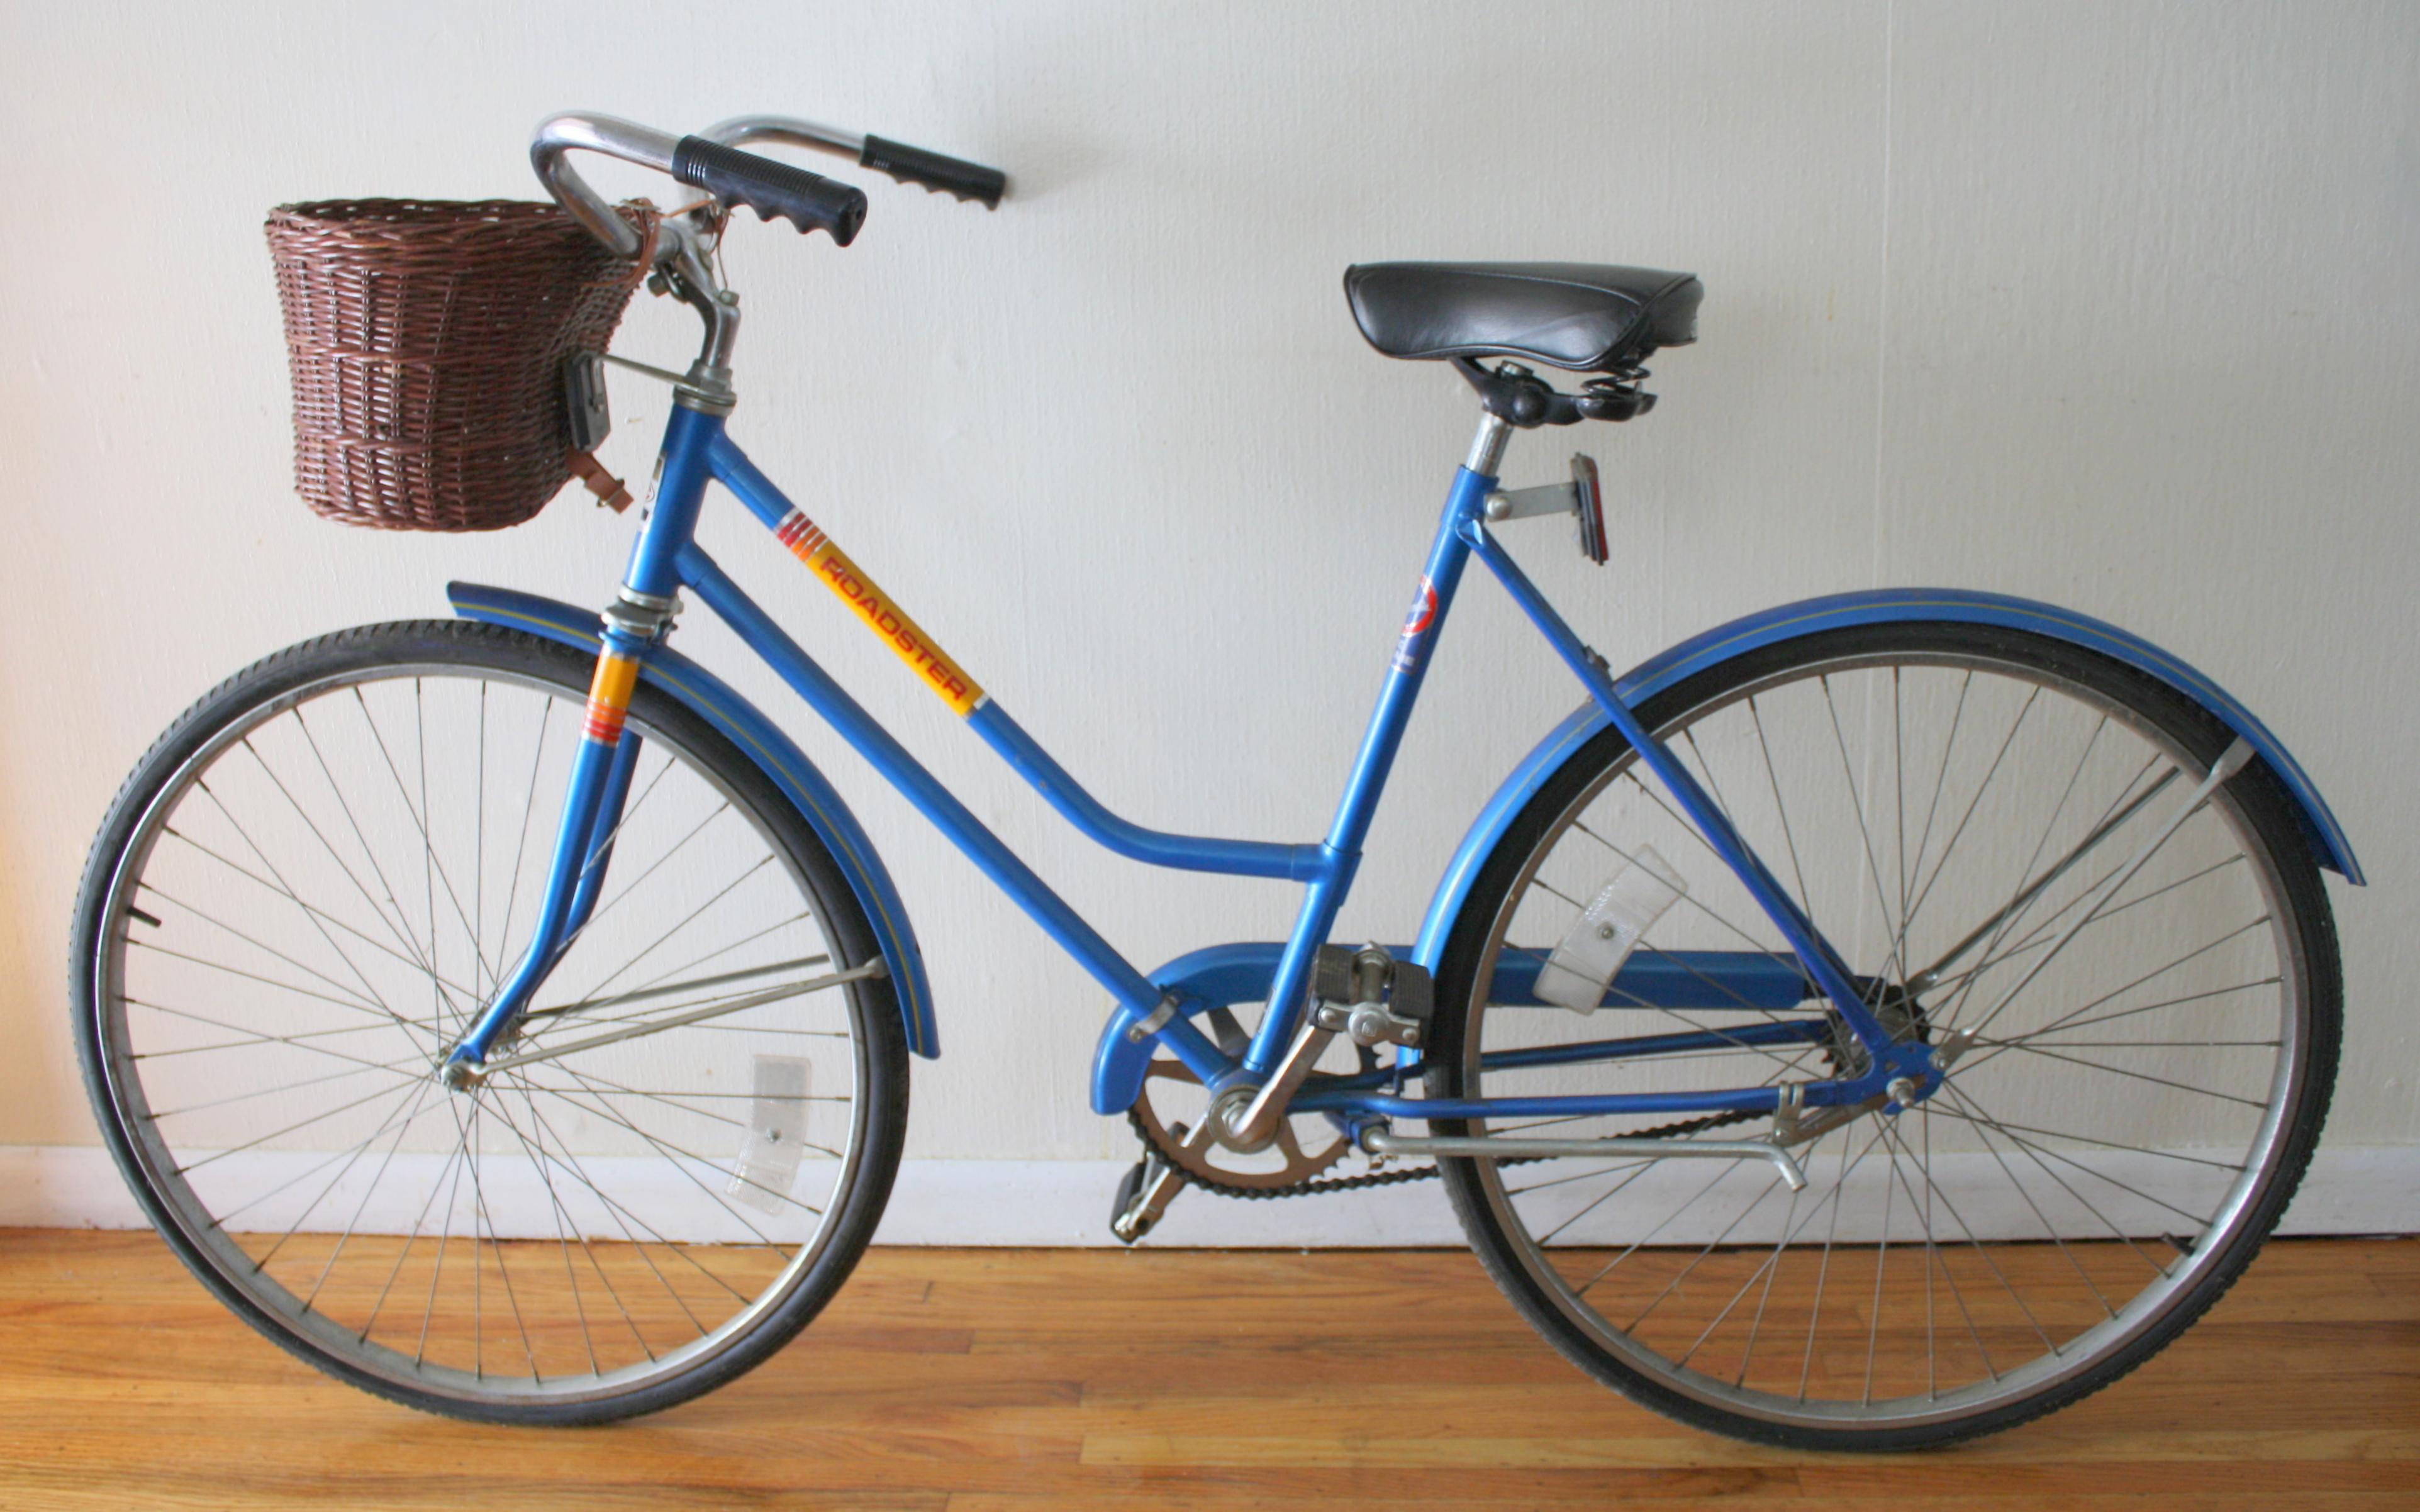 Vintage Columbia Roadster Cruiser Bicycle With Basket